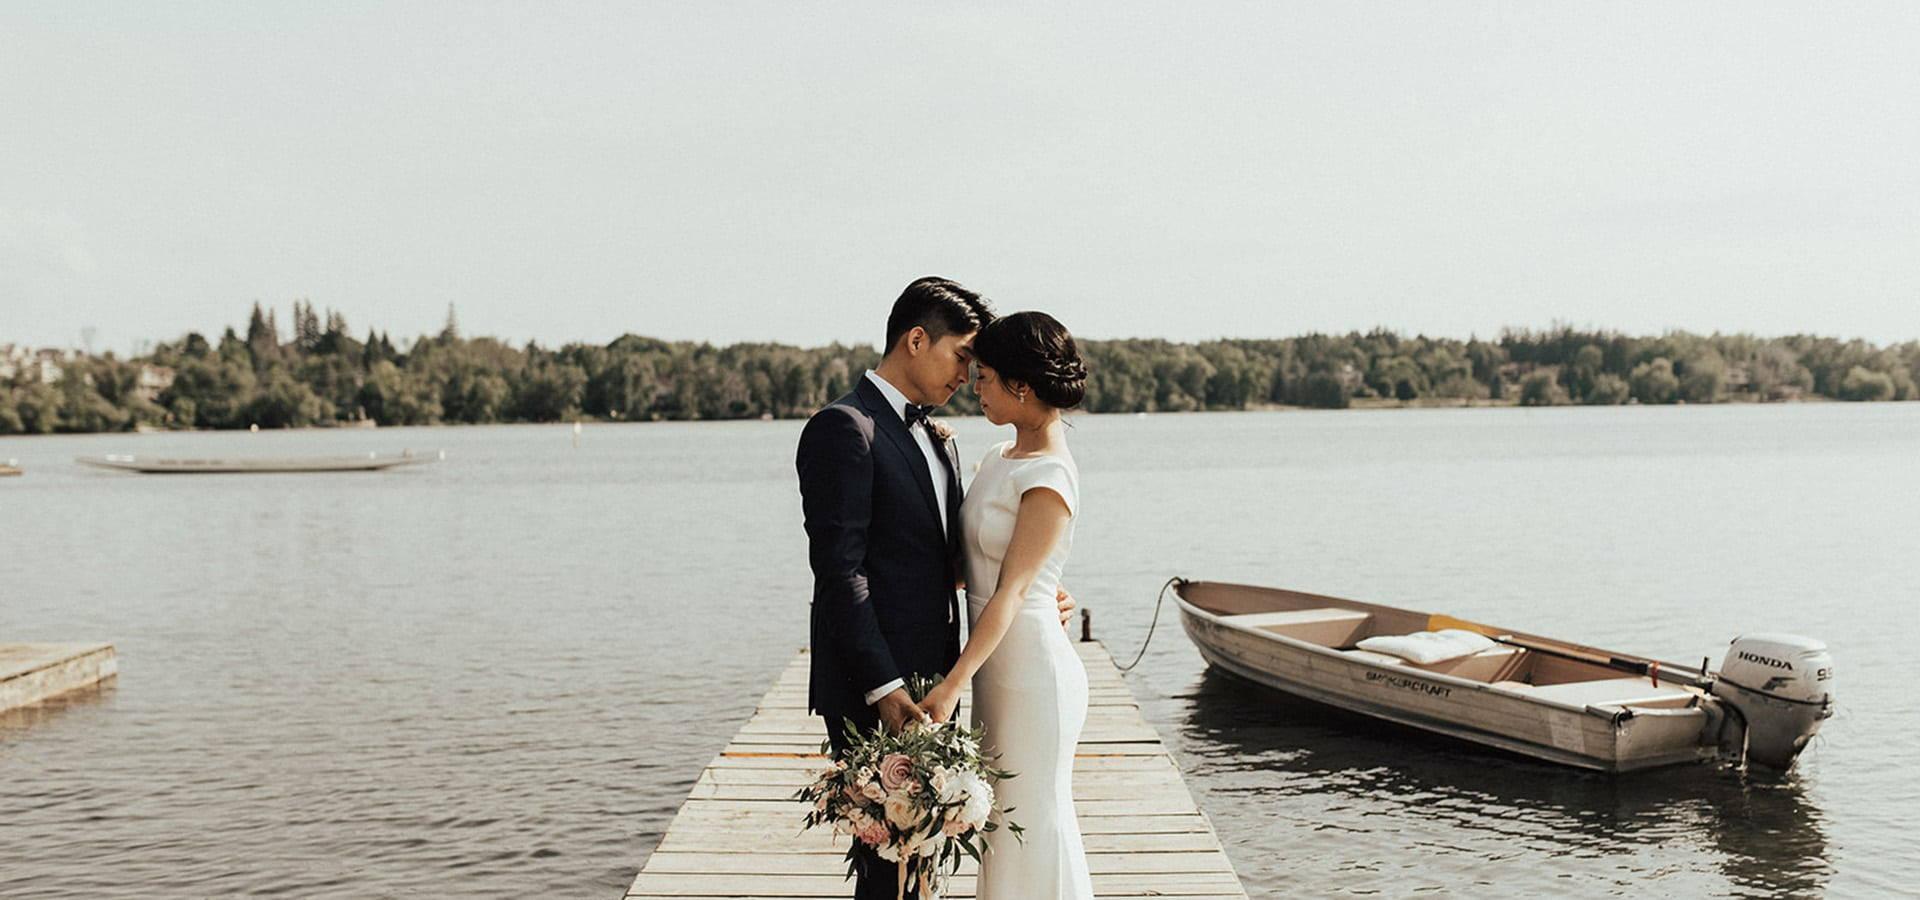 Hero image for Esther and David's Romantic Backyard Wedding